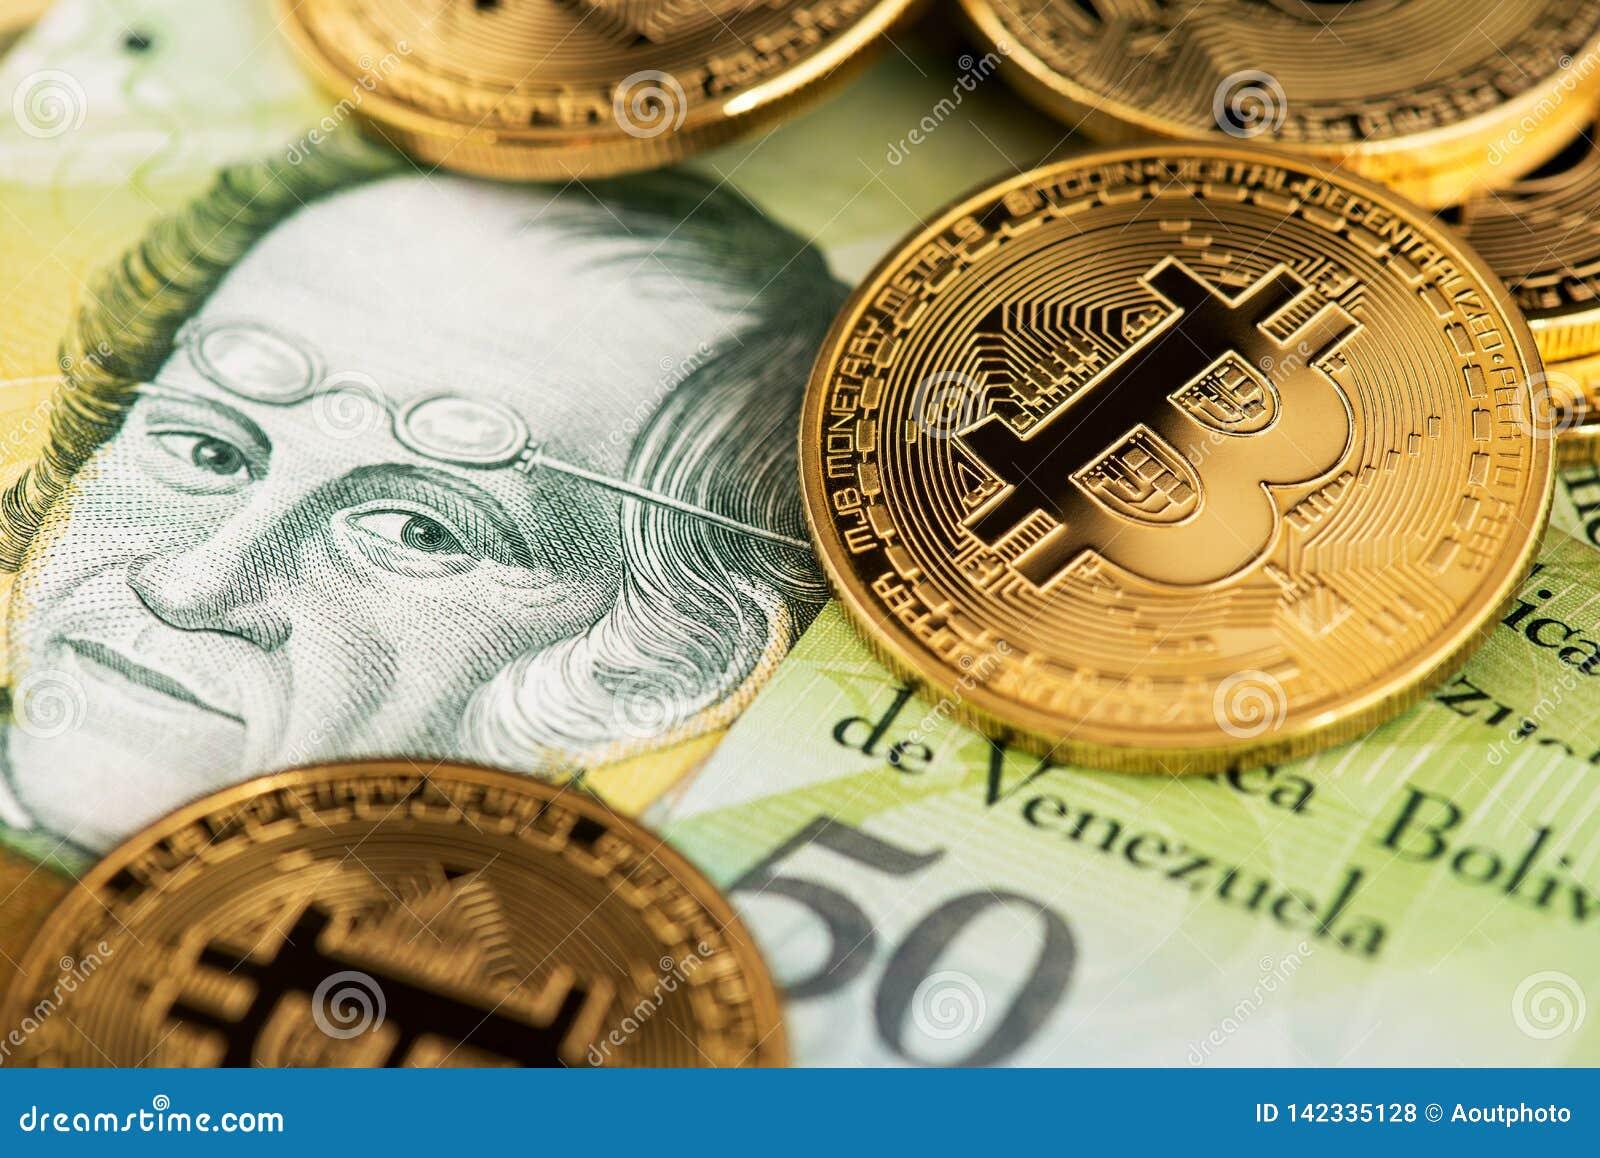 btc piacok poli finnország bitcoin